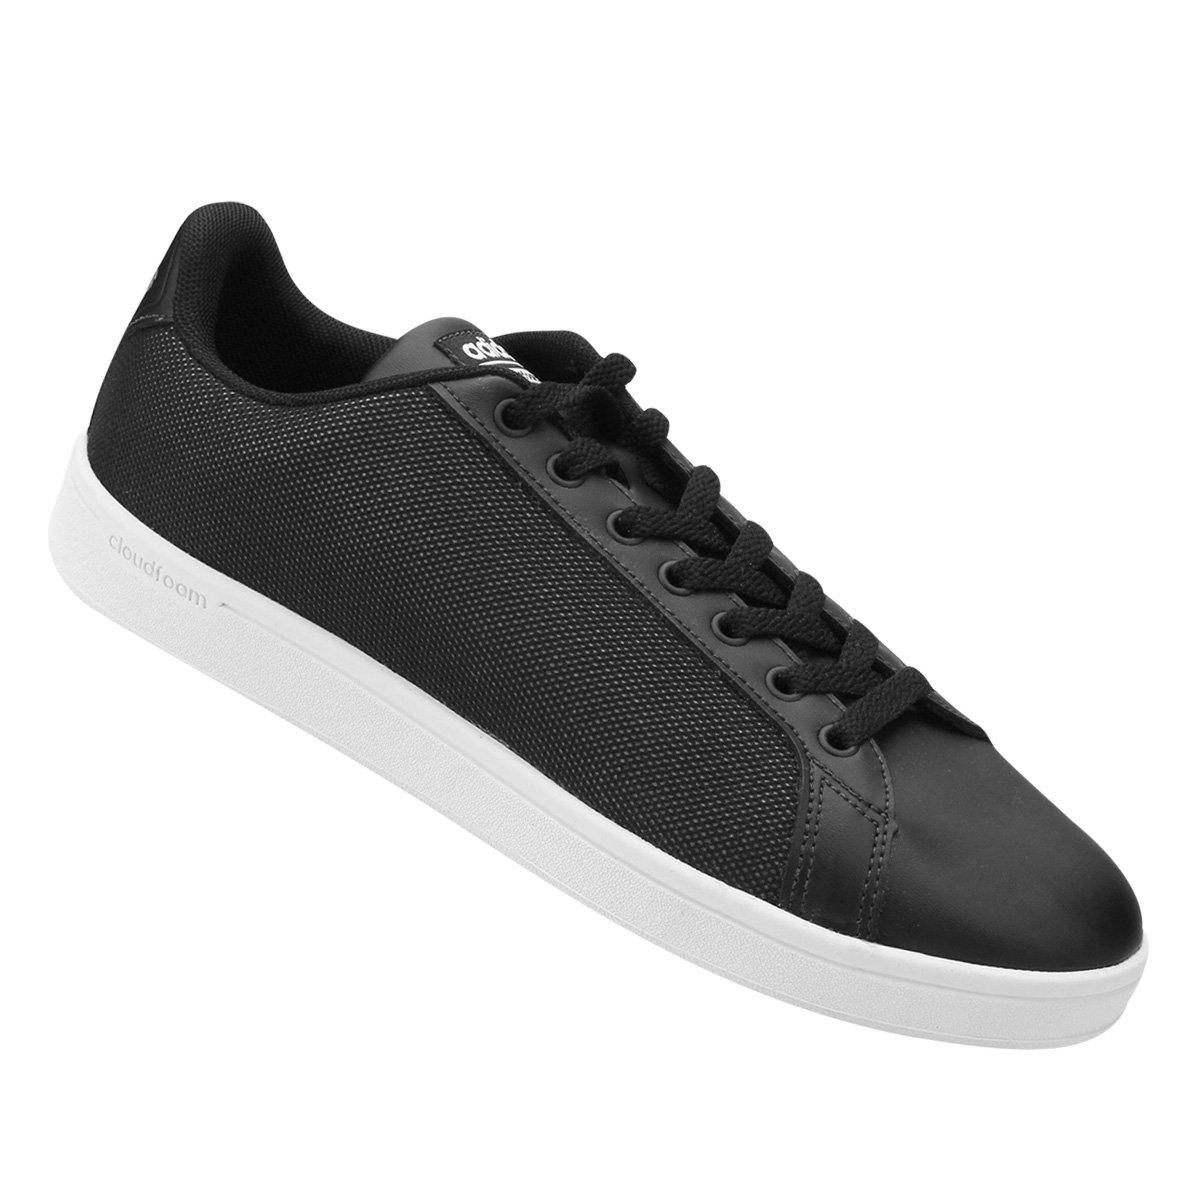 c6d9900dde4 Tênis Adidas CF Advantage Clean Masculino - Compre Agora